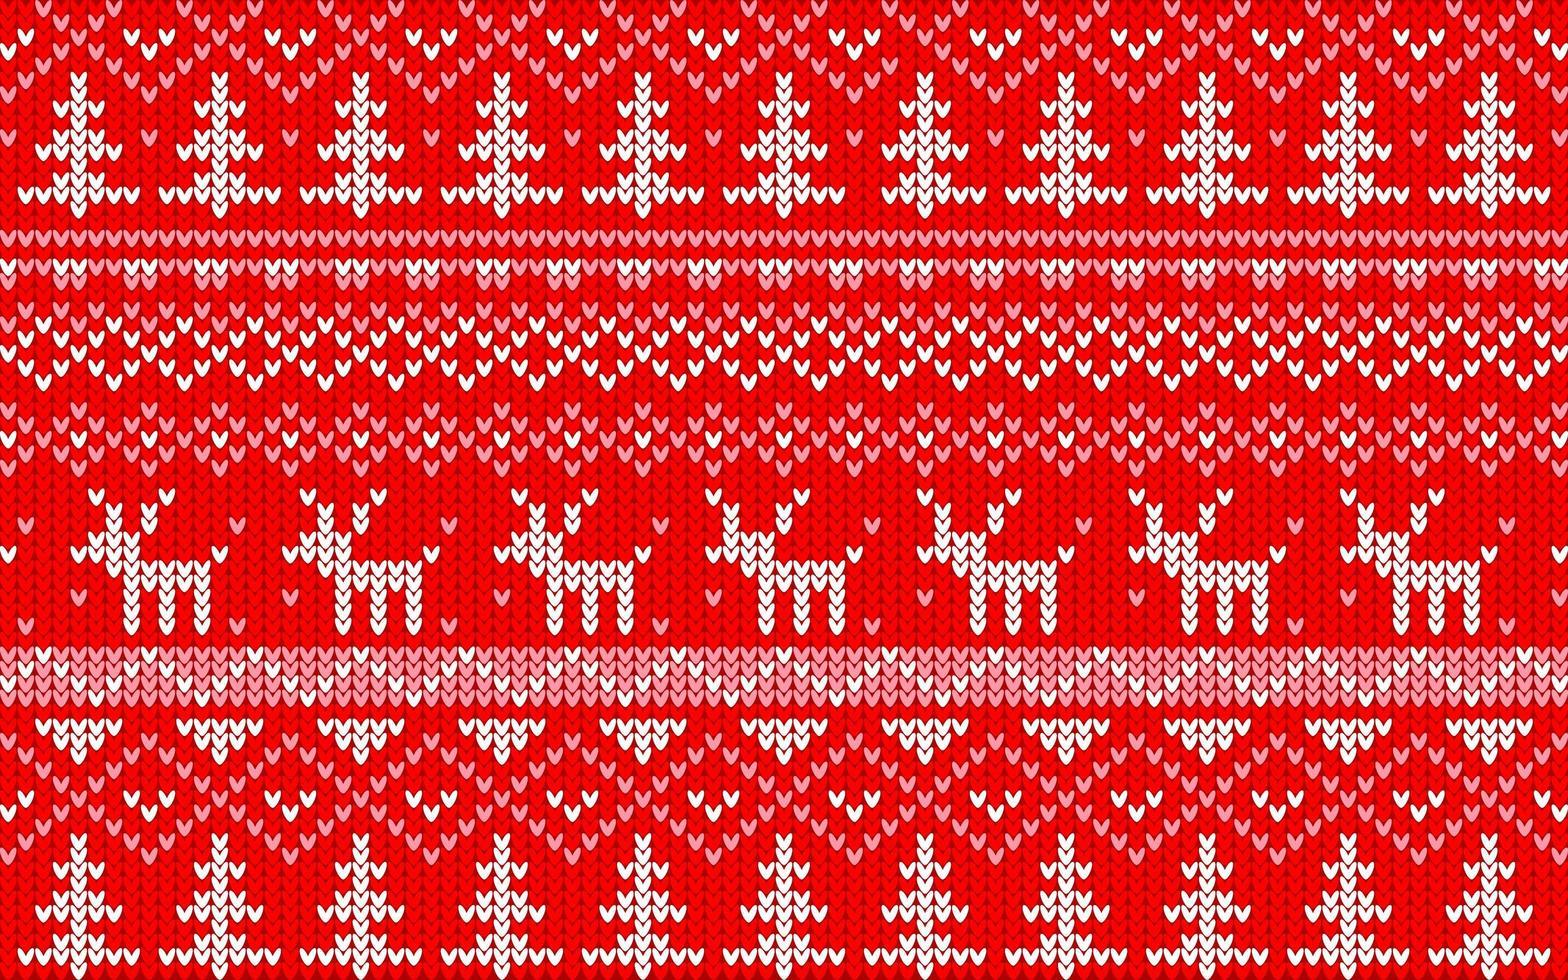 kerst jaquard patroon rood en wit vector